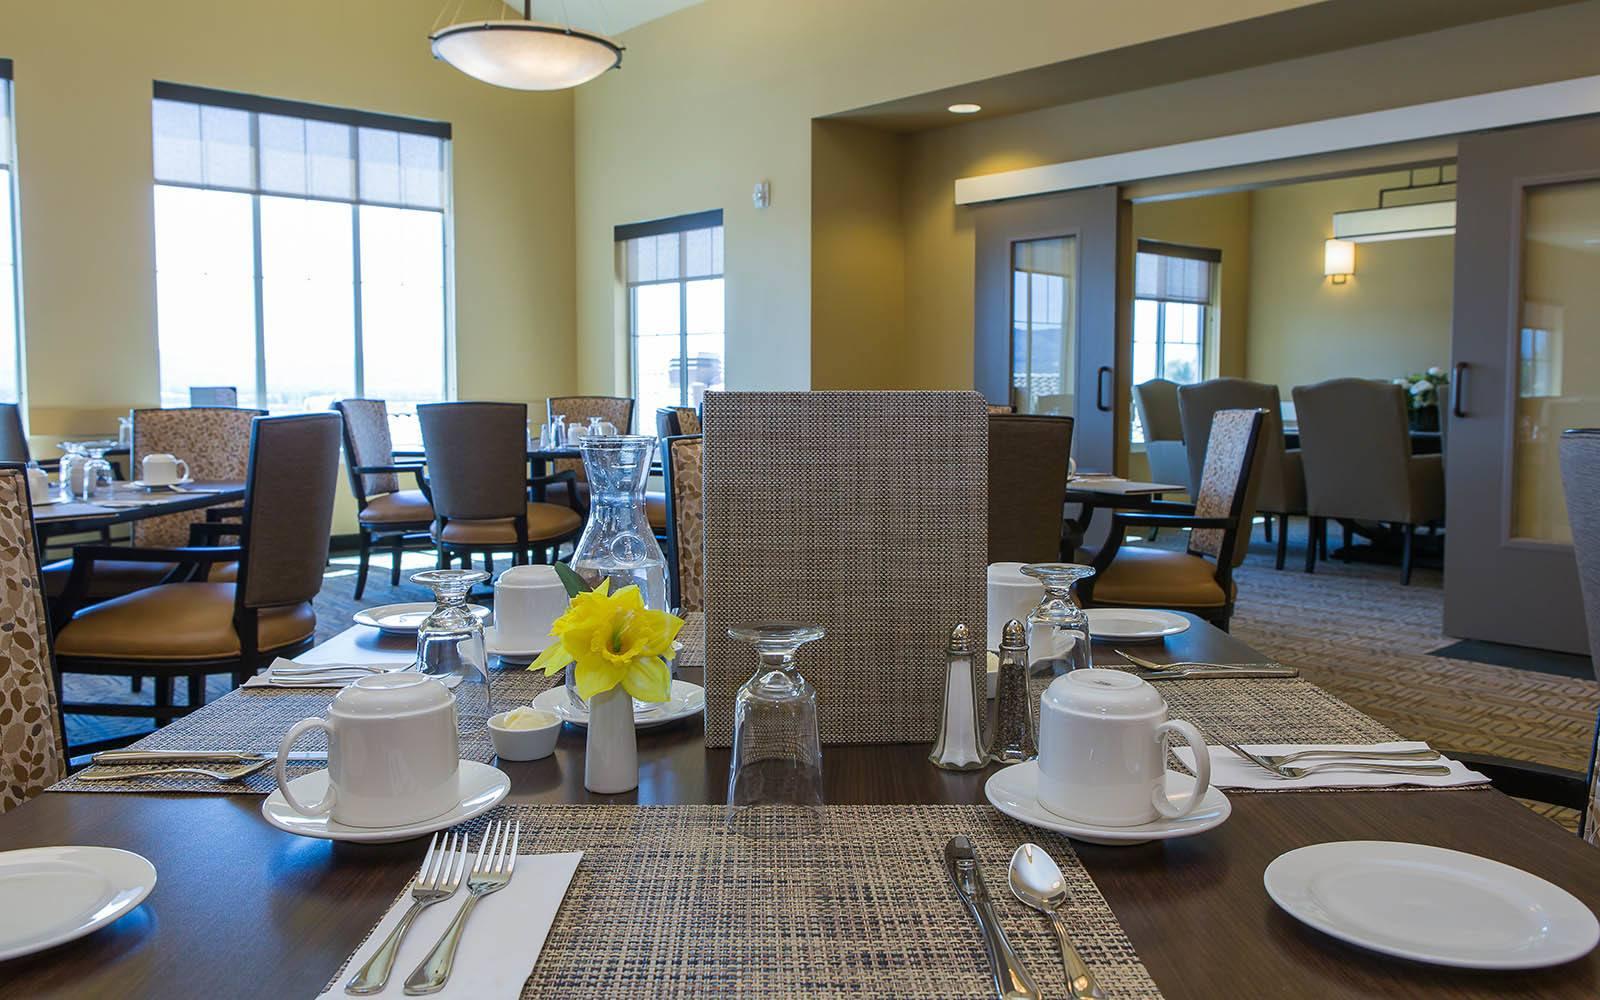 Dining Room at Brightwater Senior Living of Highland in Highland, CA